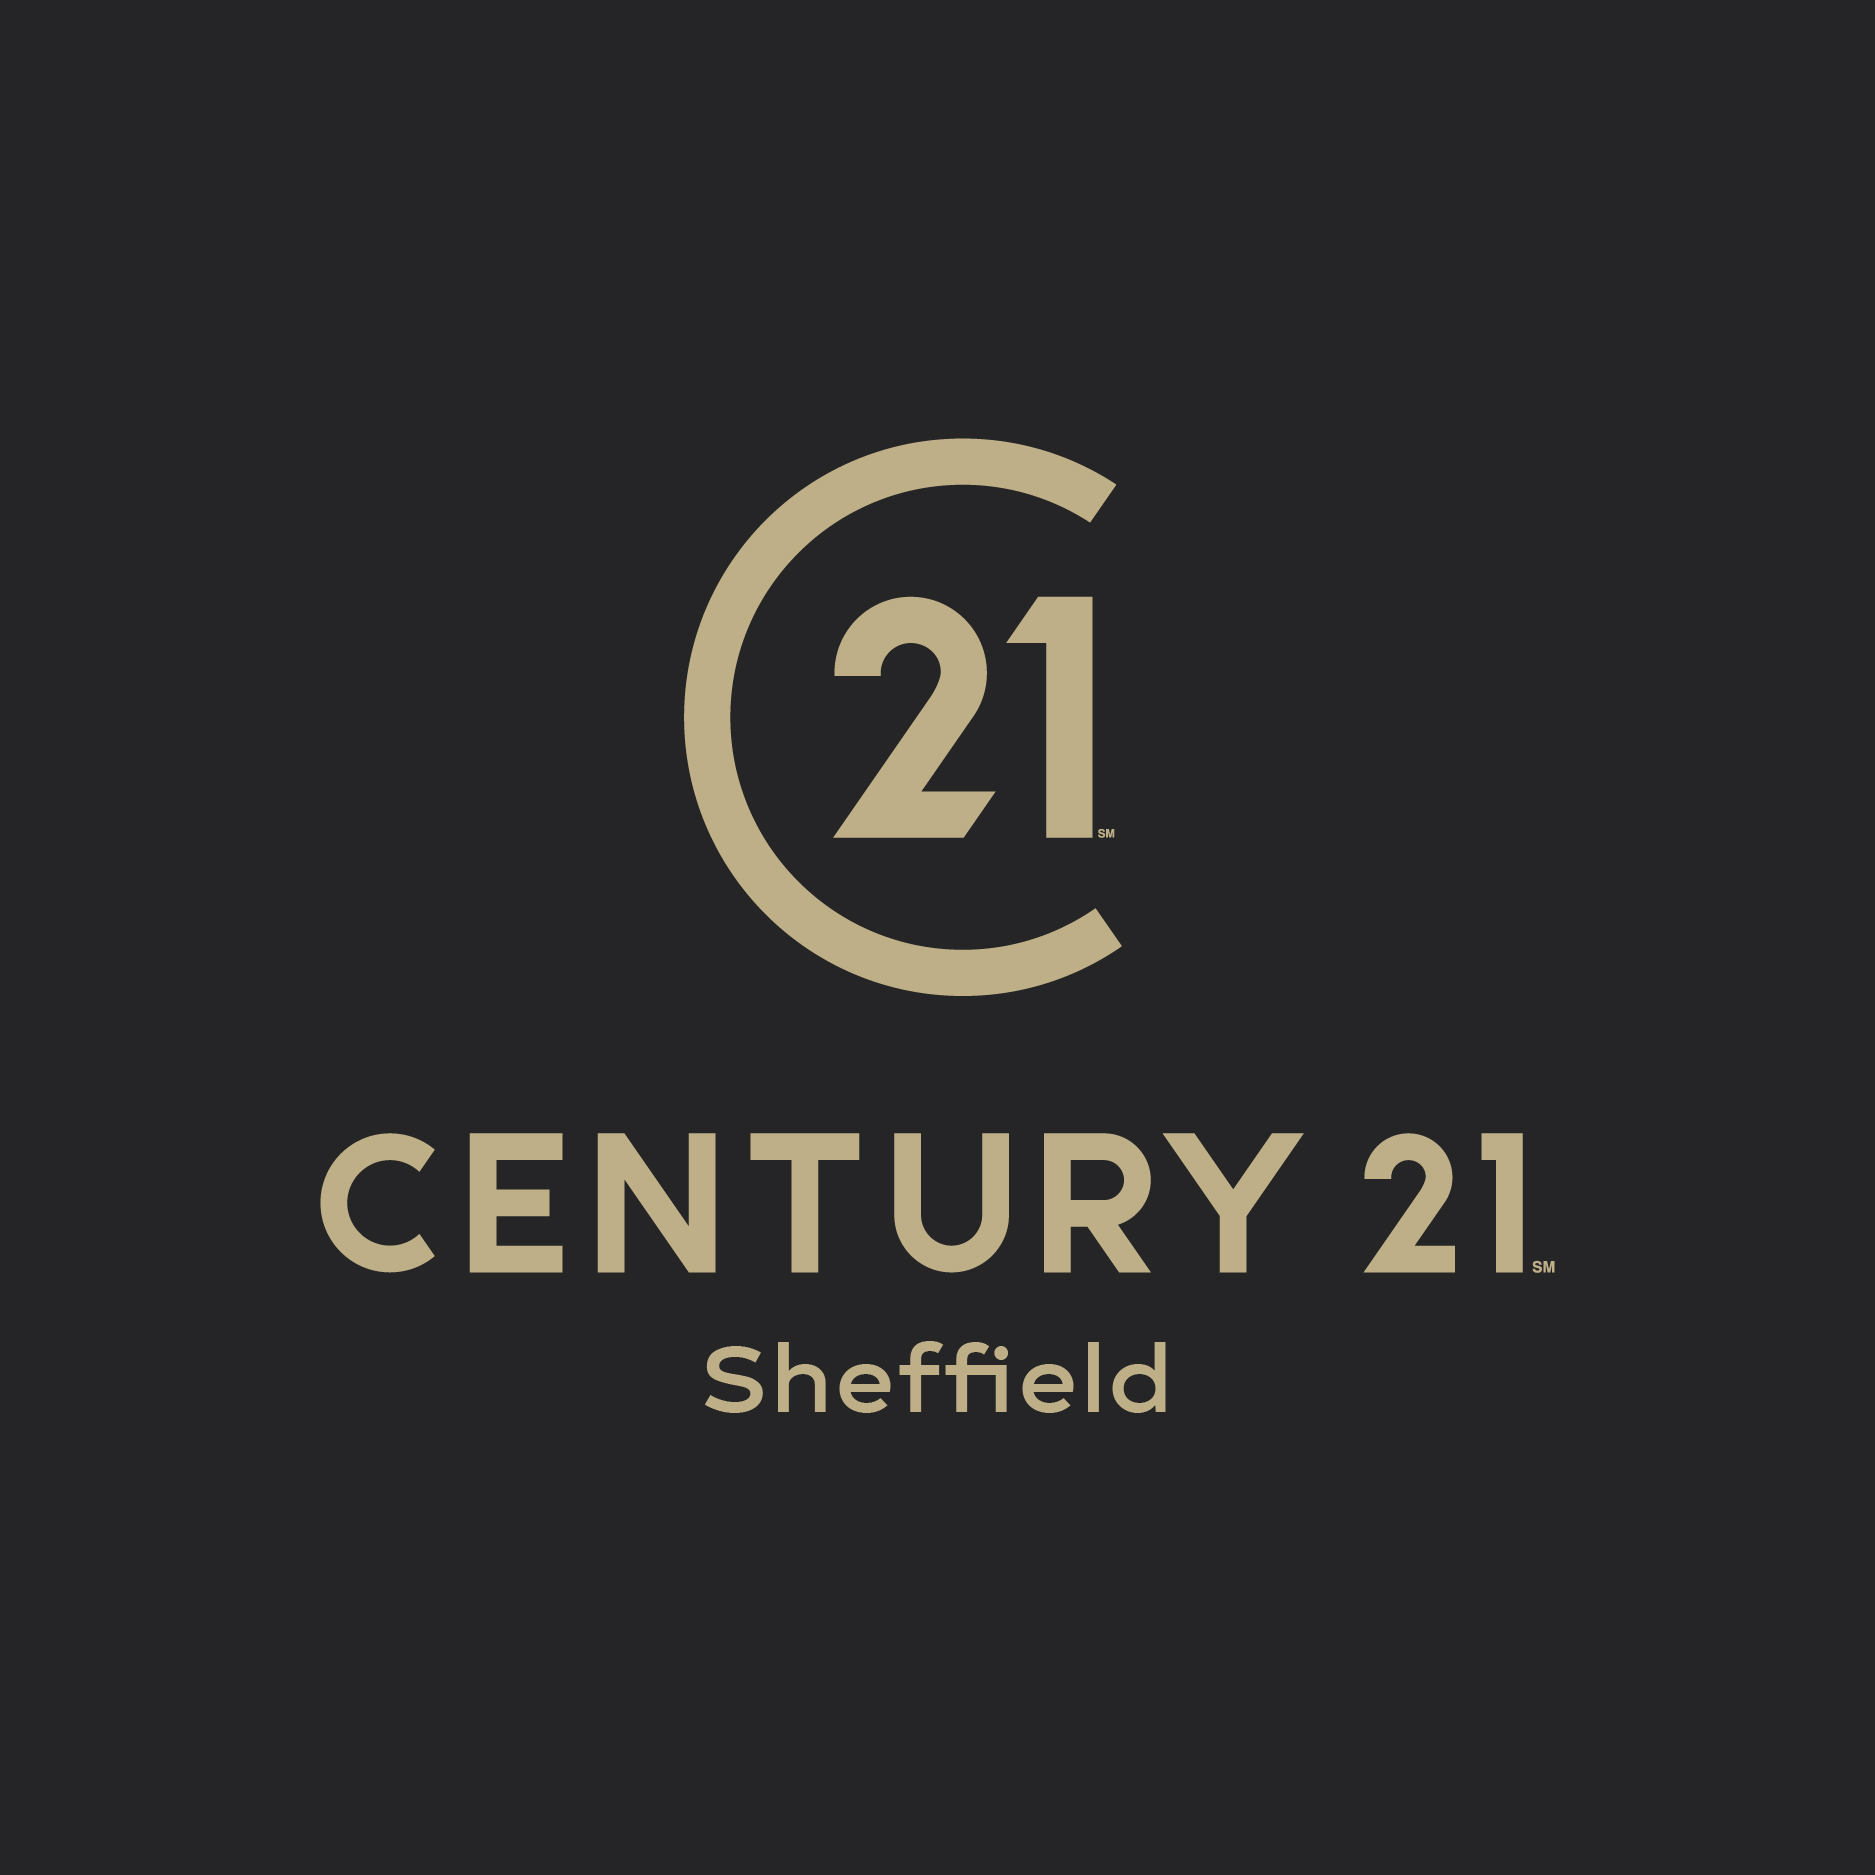 Century 21 - Sheffield